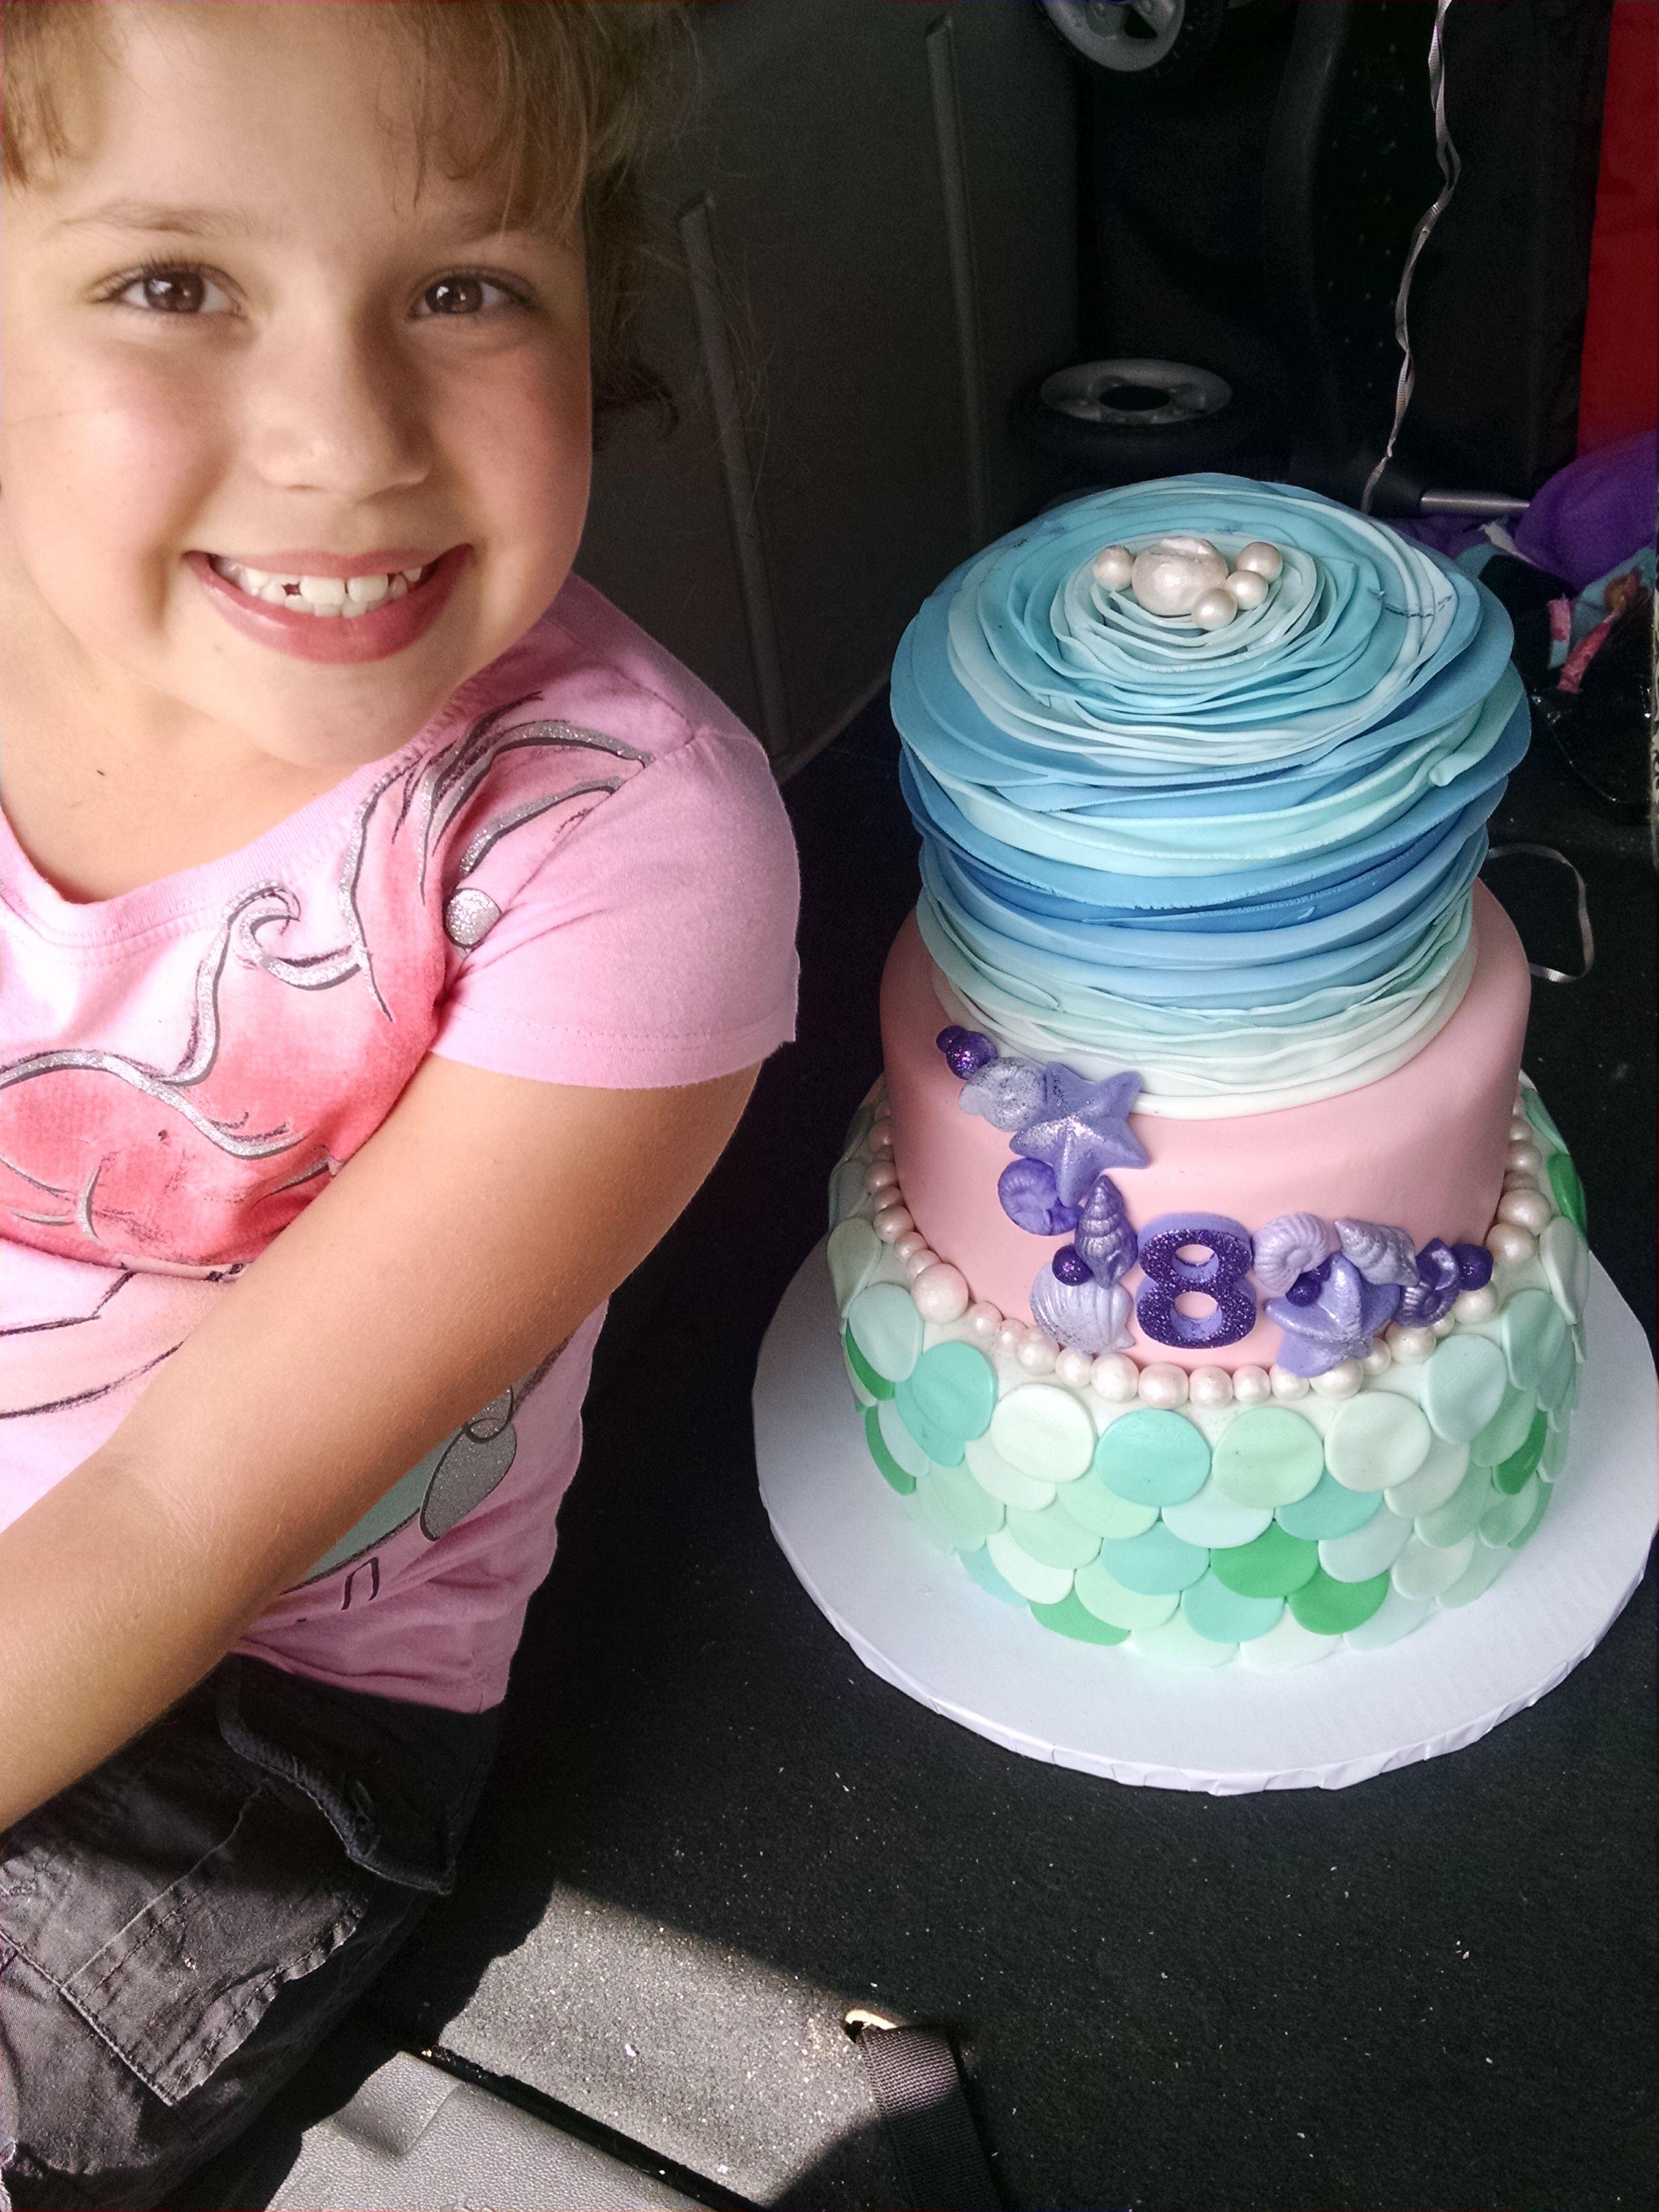 Awesome Sydney Loved Her Cake Thank You To Sugar Angel Lindsay Wehmeyer Funny Birthday Cards Online Hendilapandamsfinfo